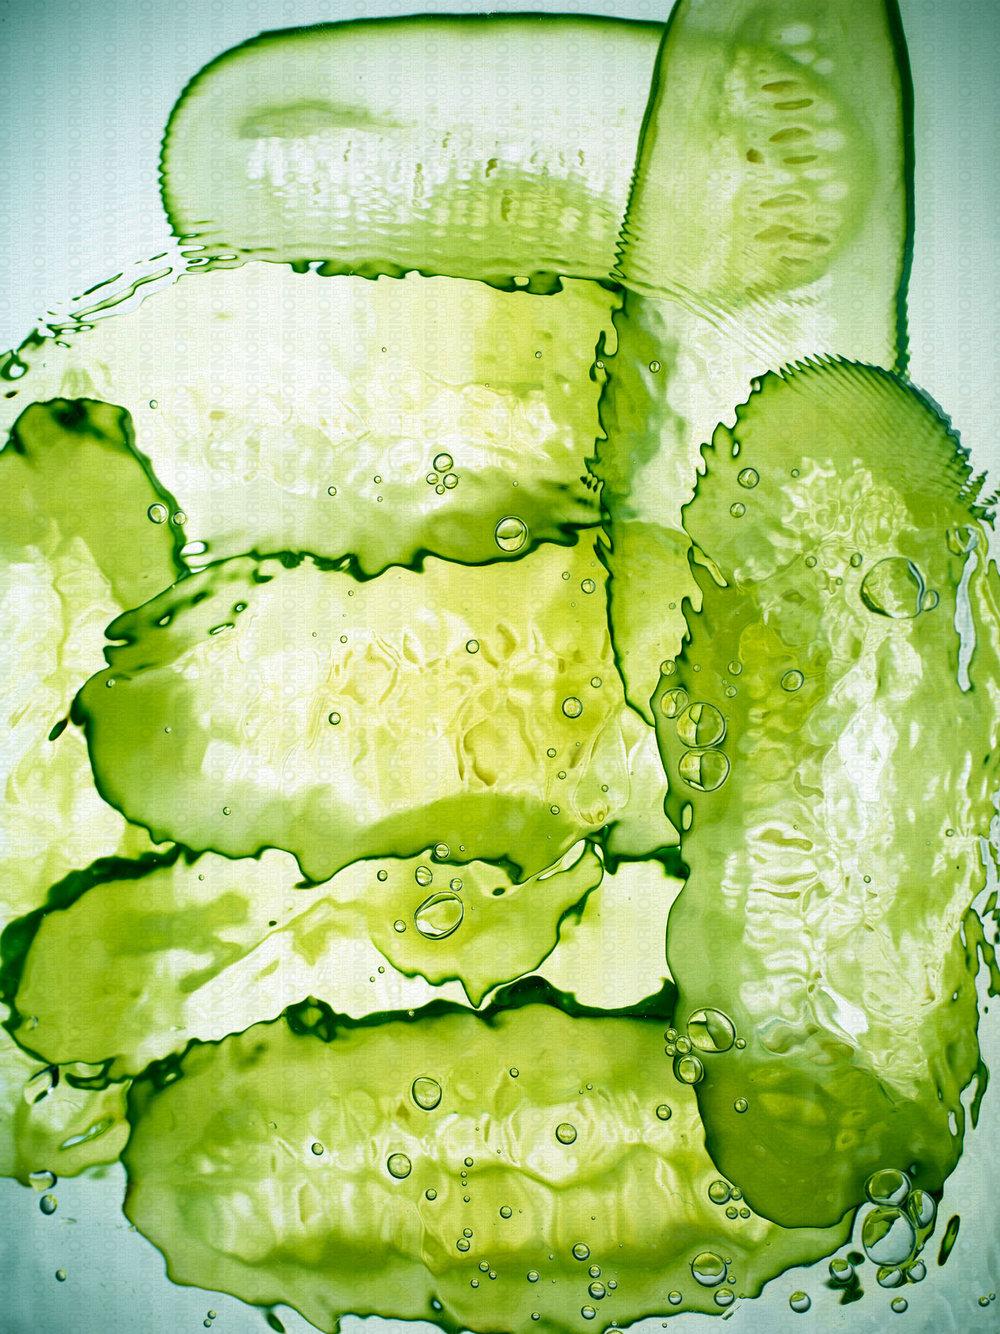 030517_cucumber153952.jpg